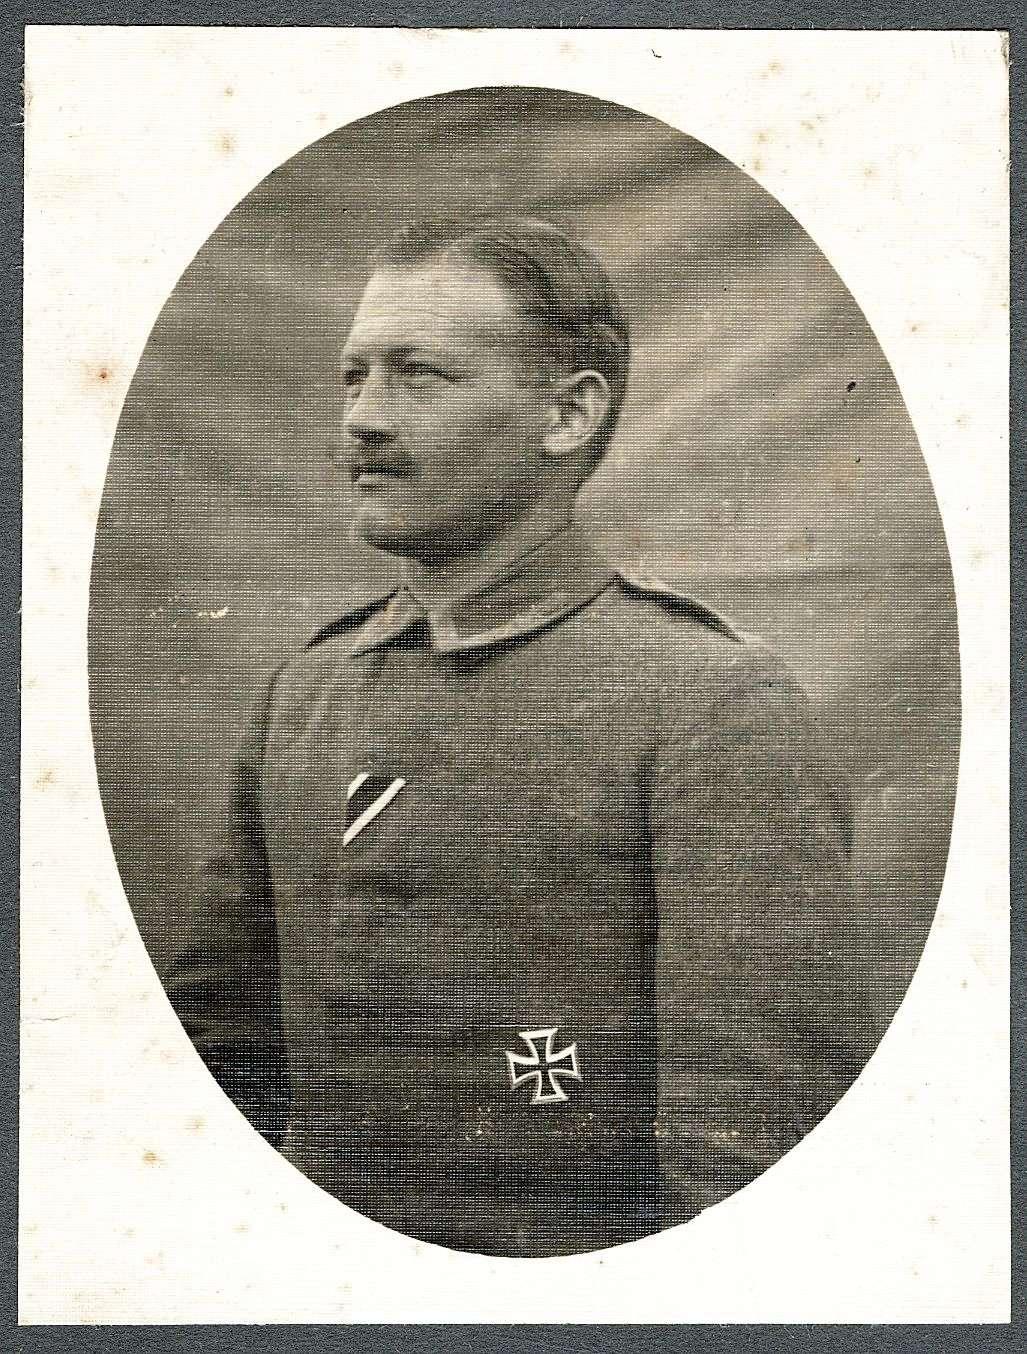 Dambacher, Josef, Bild 1